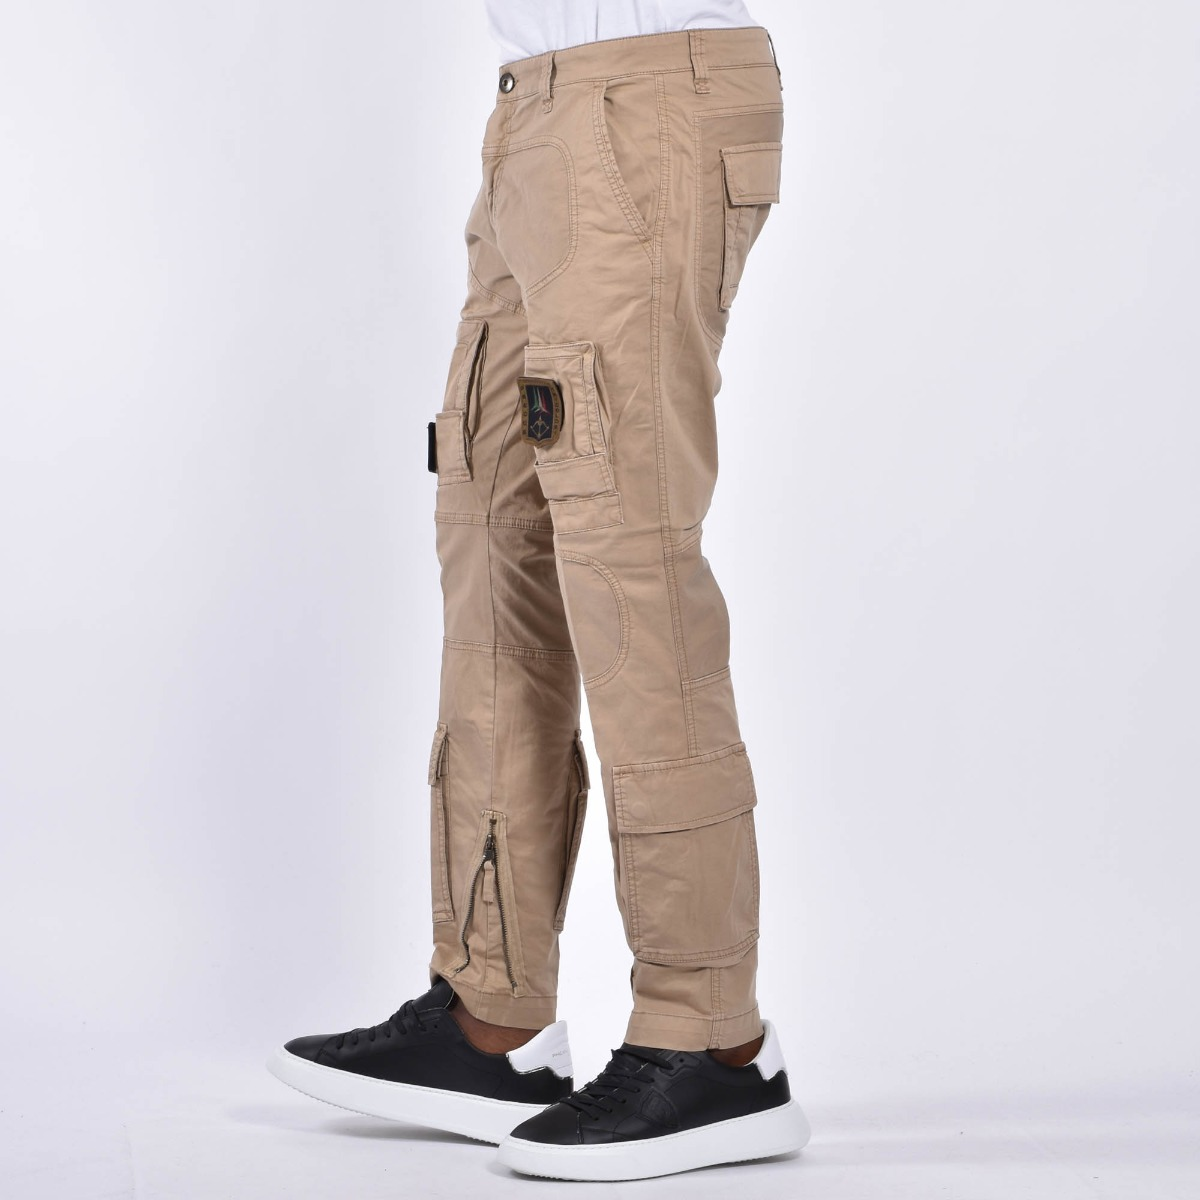 Pantalone anti-g tasconi - Beige